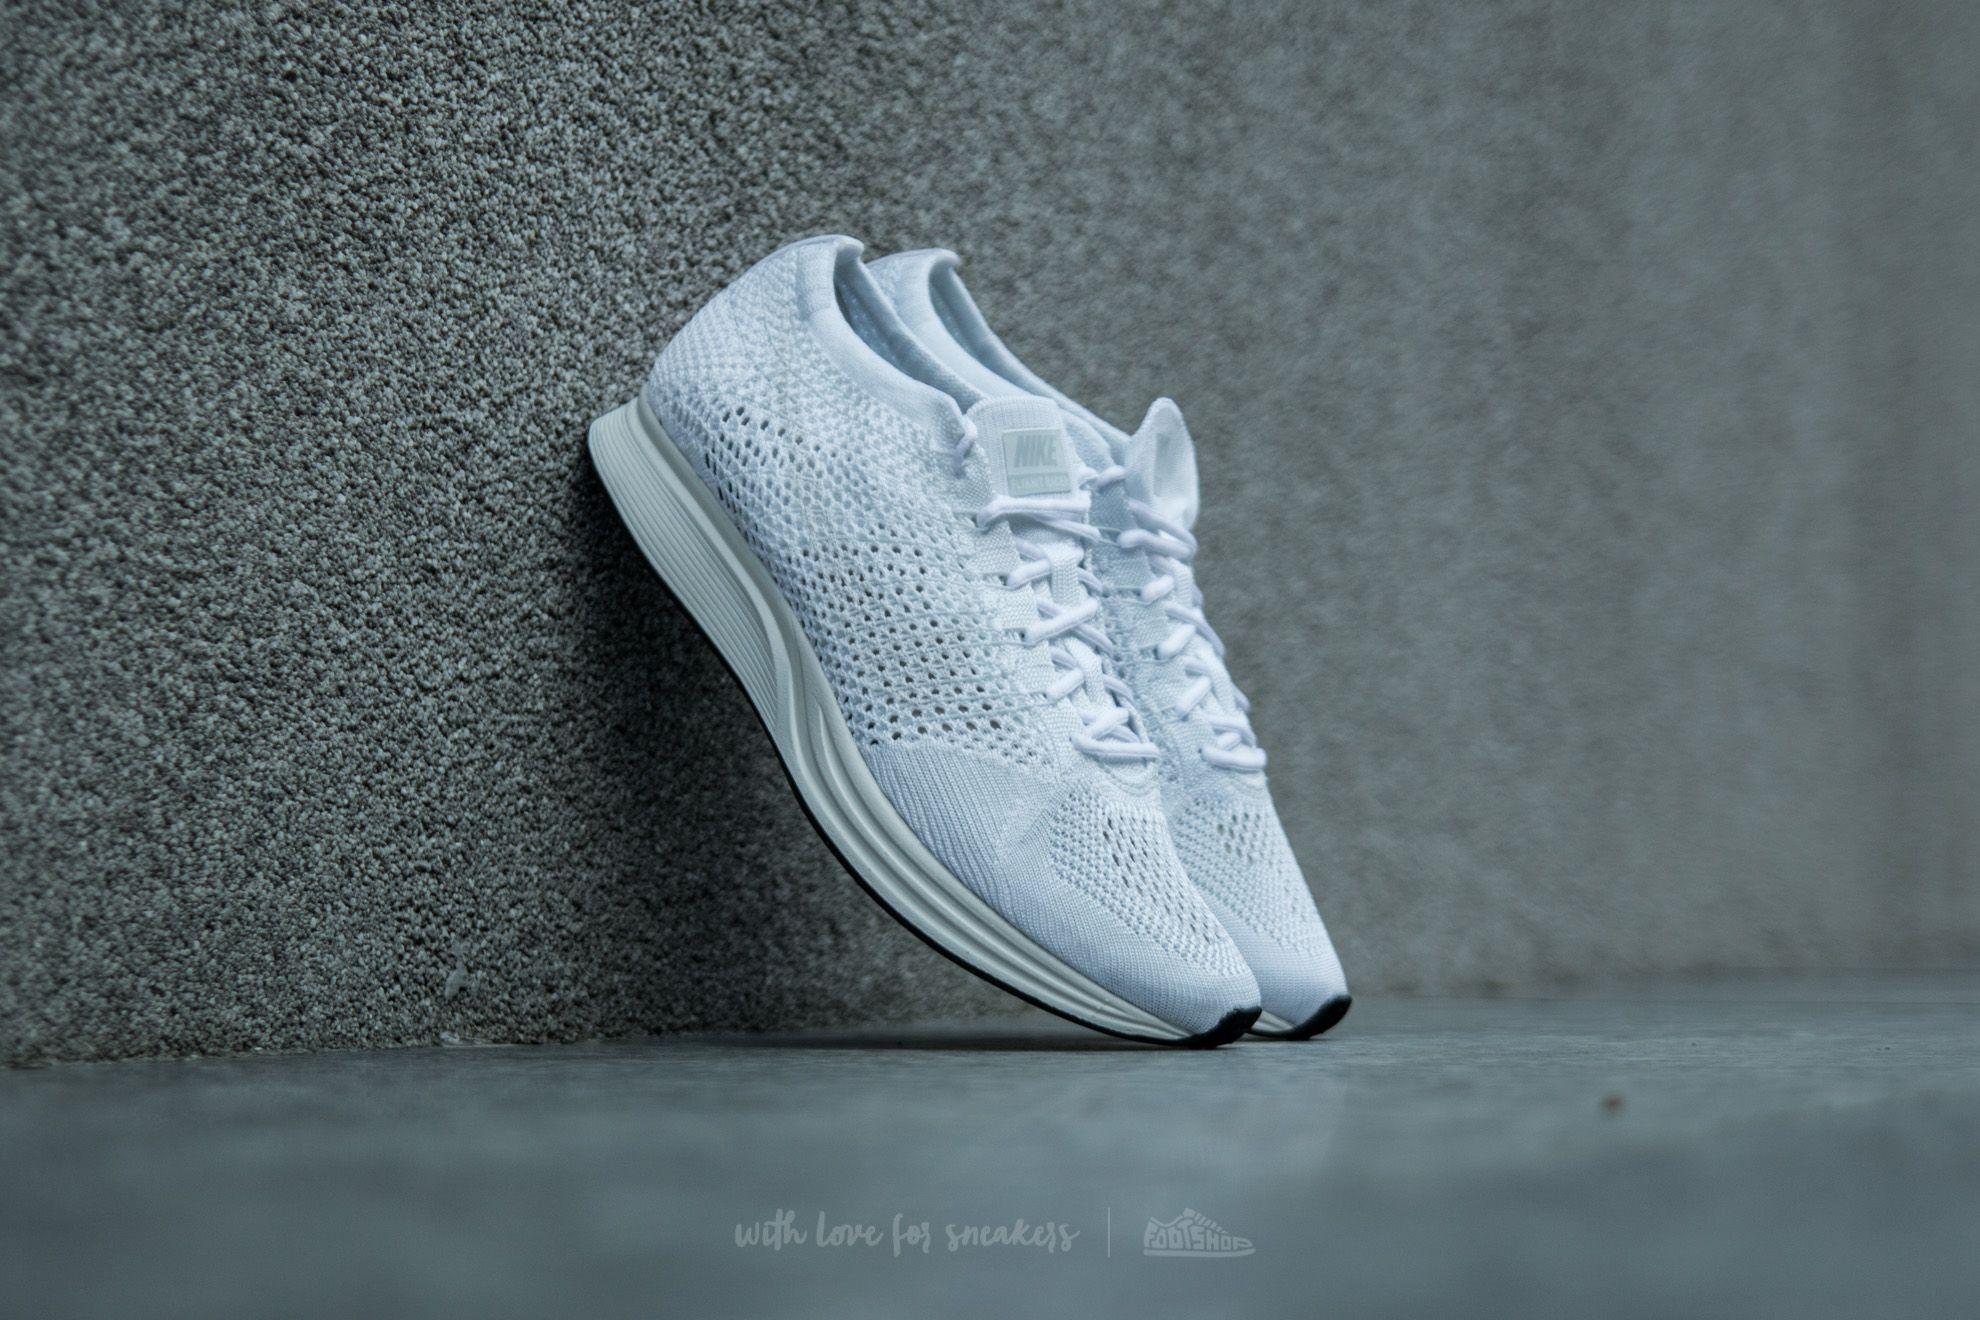 a59dd9cc2abff uk nike flyknit racer white white sail sneaker 94771 6b72b  where to buy nike  flyknit racer c6137 d2831